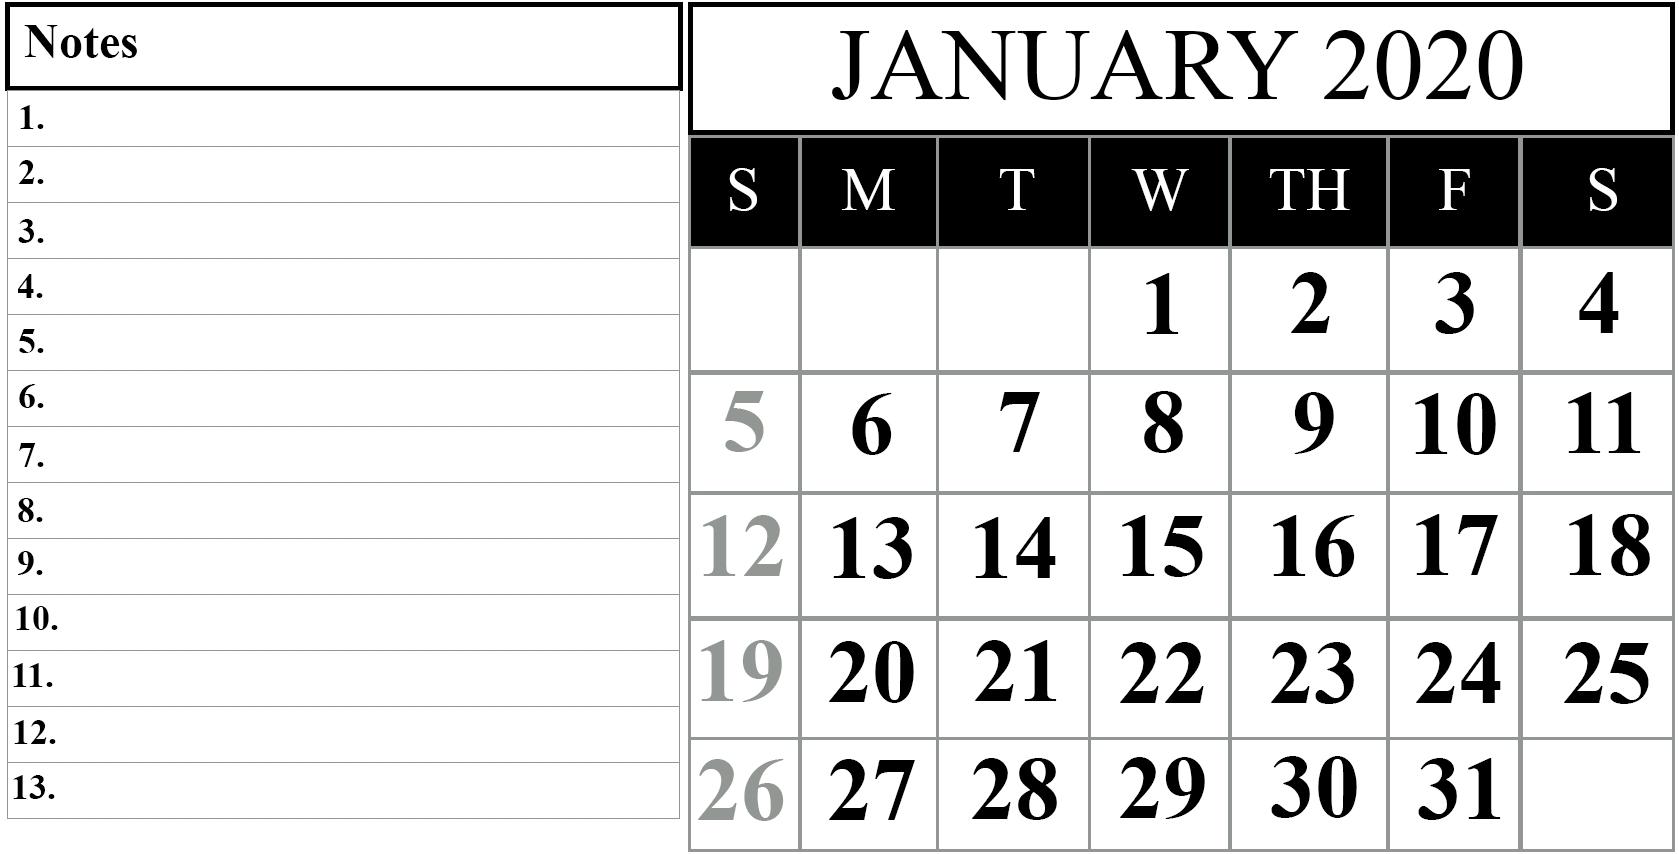 Free January 2020 Printable Calendar In Pdf, Excel & Word-January 2020 Calendar Word